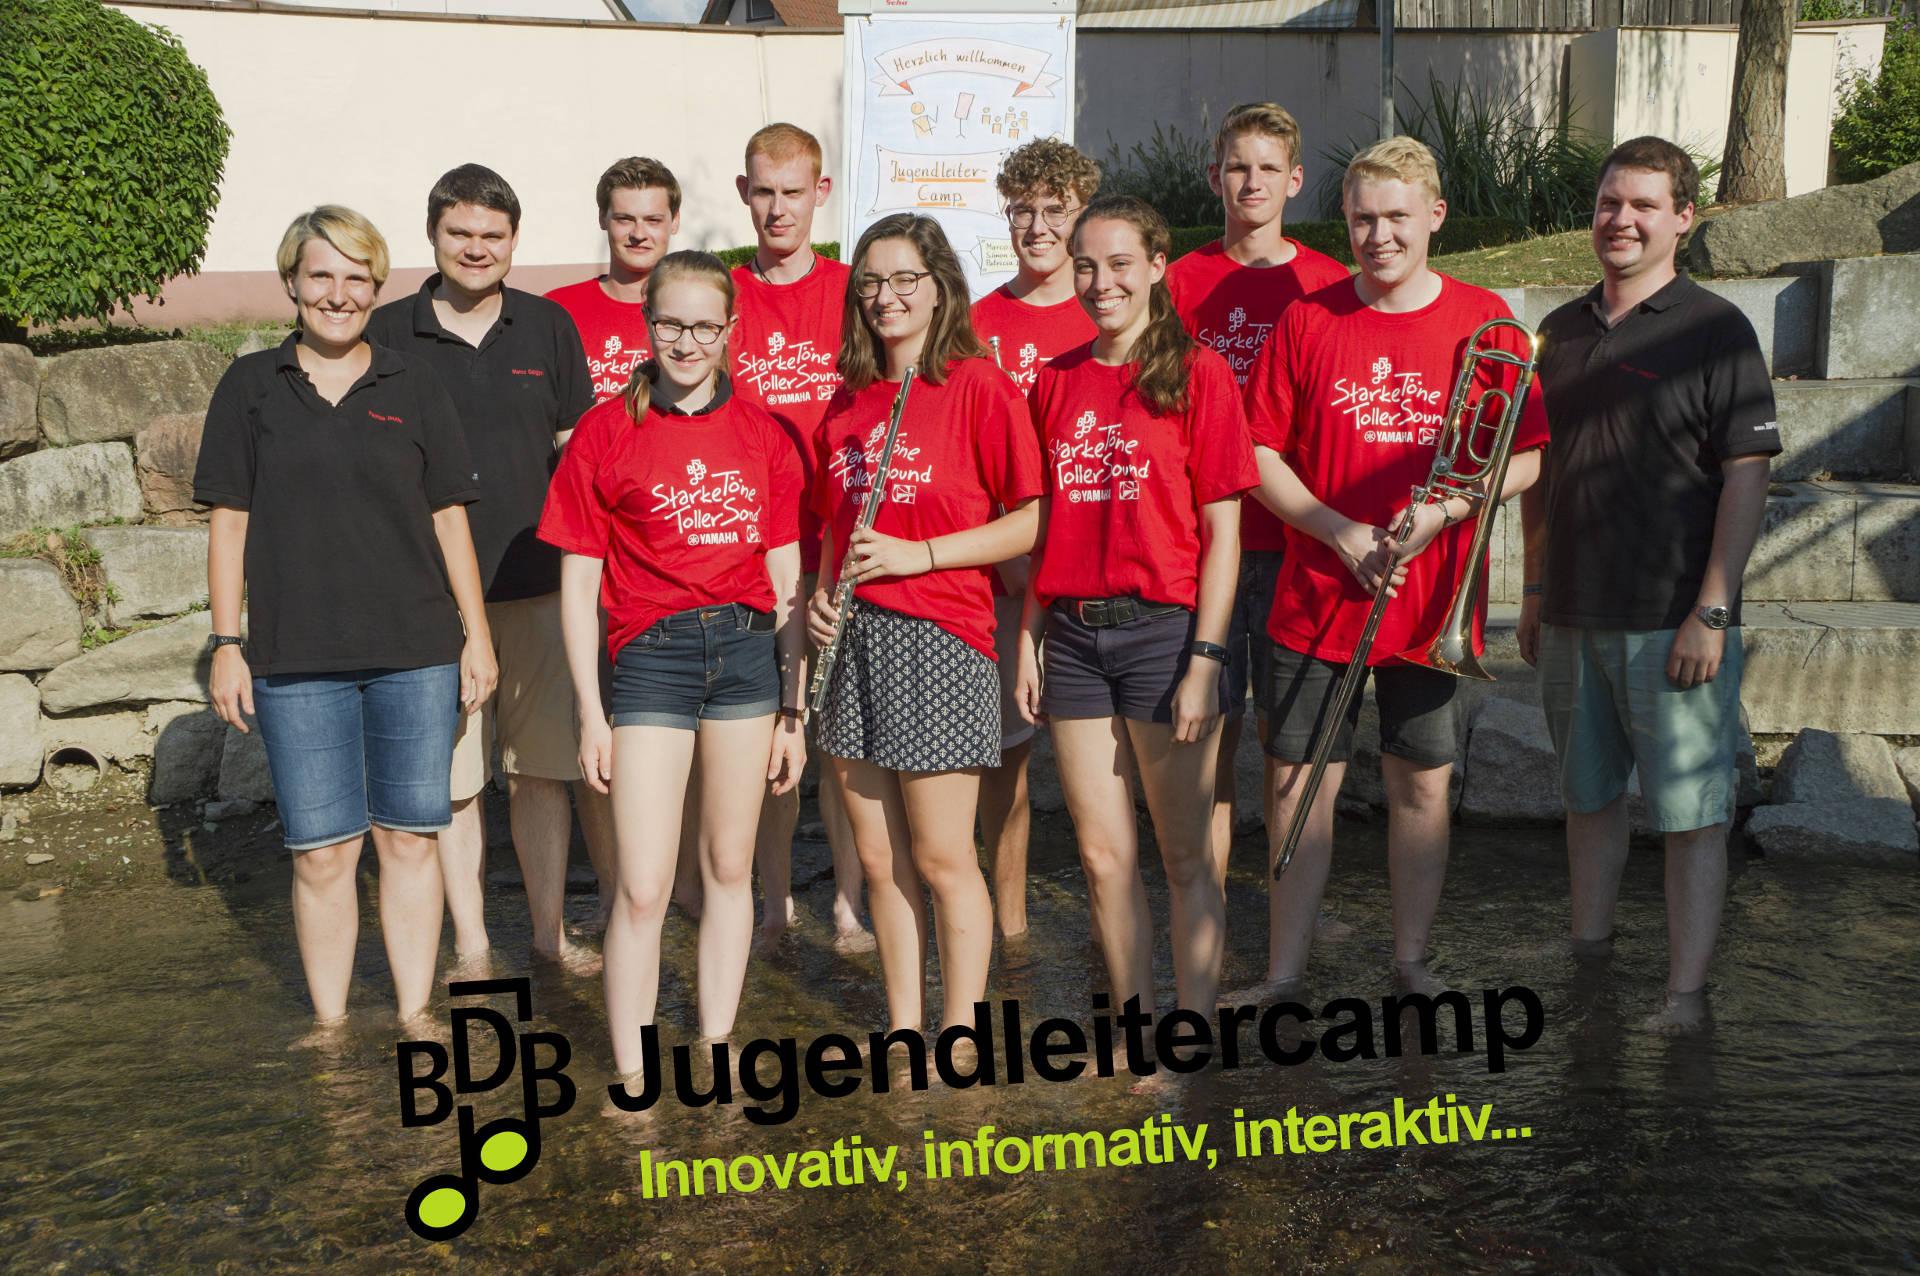 Gruppenfoto BDB-Jugendleitercamp 2018